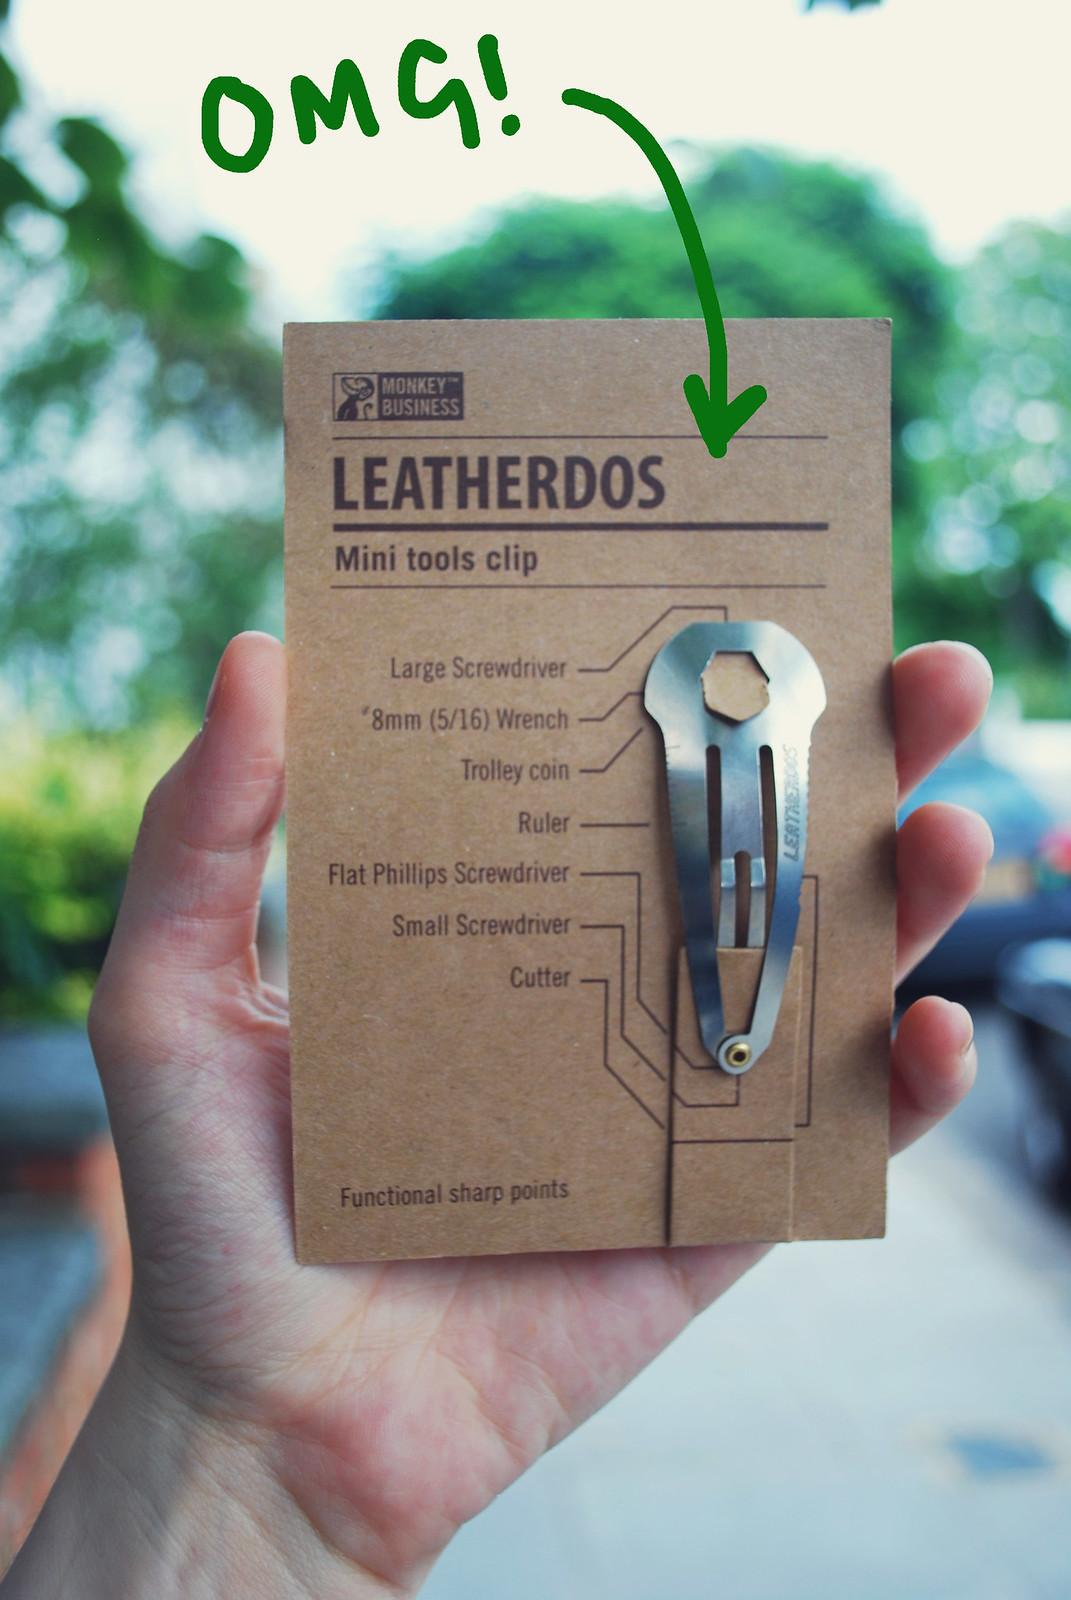 Leatherdos review